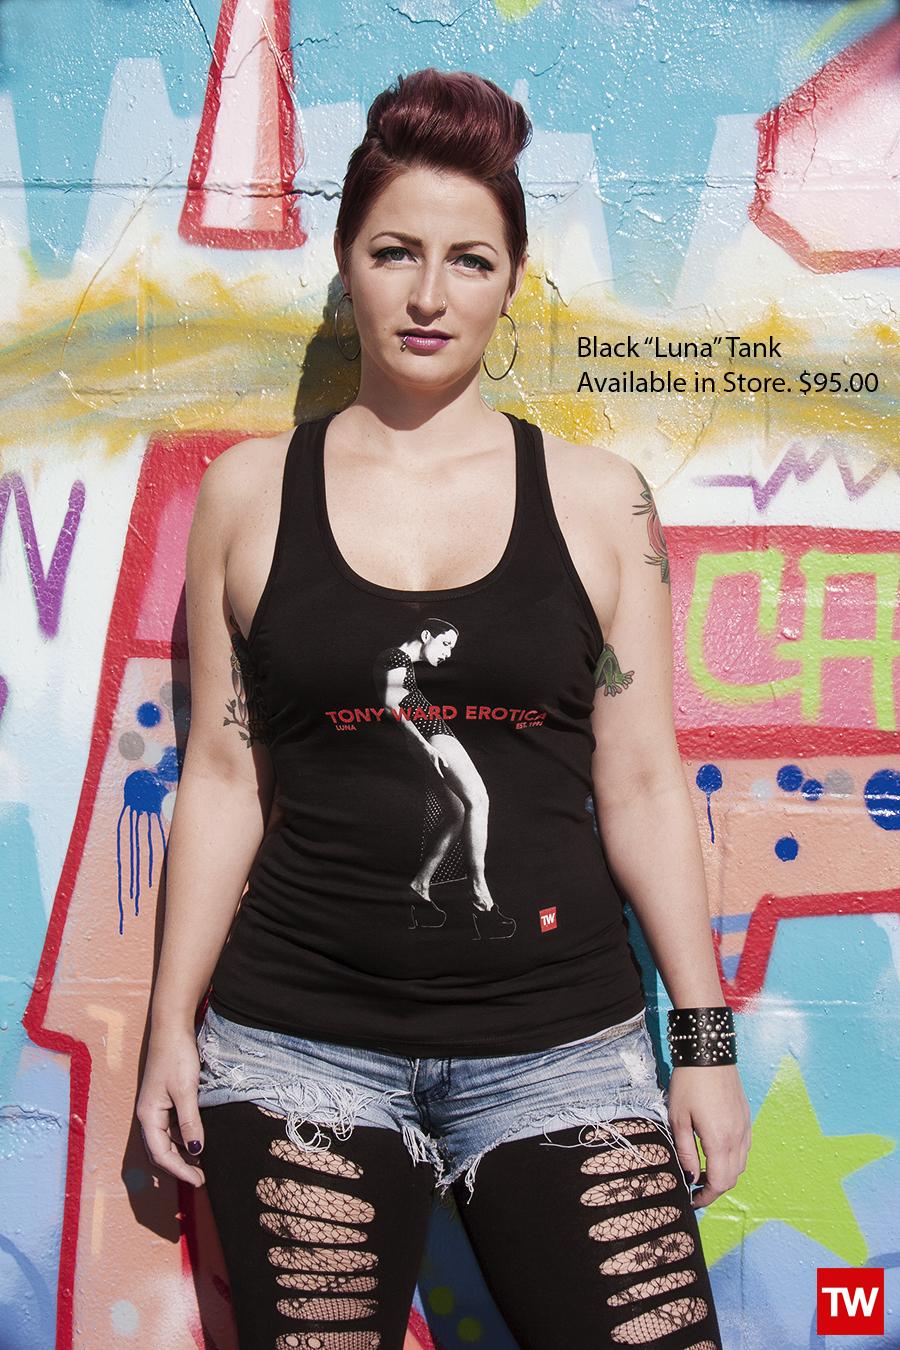 Tony_Ward_Studio_e_commerce_store_t-shirts_black_Luna_tee_sale_model_Mindy